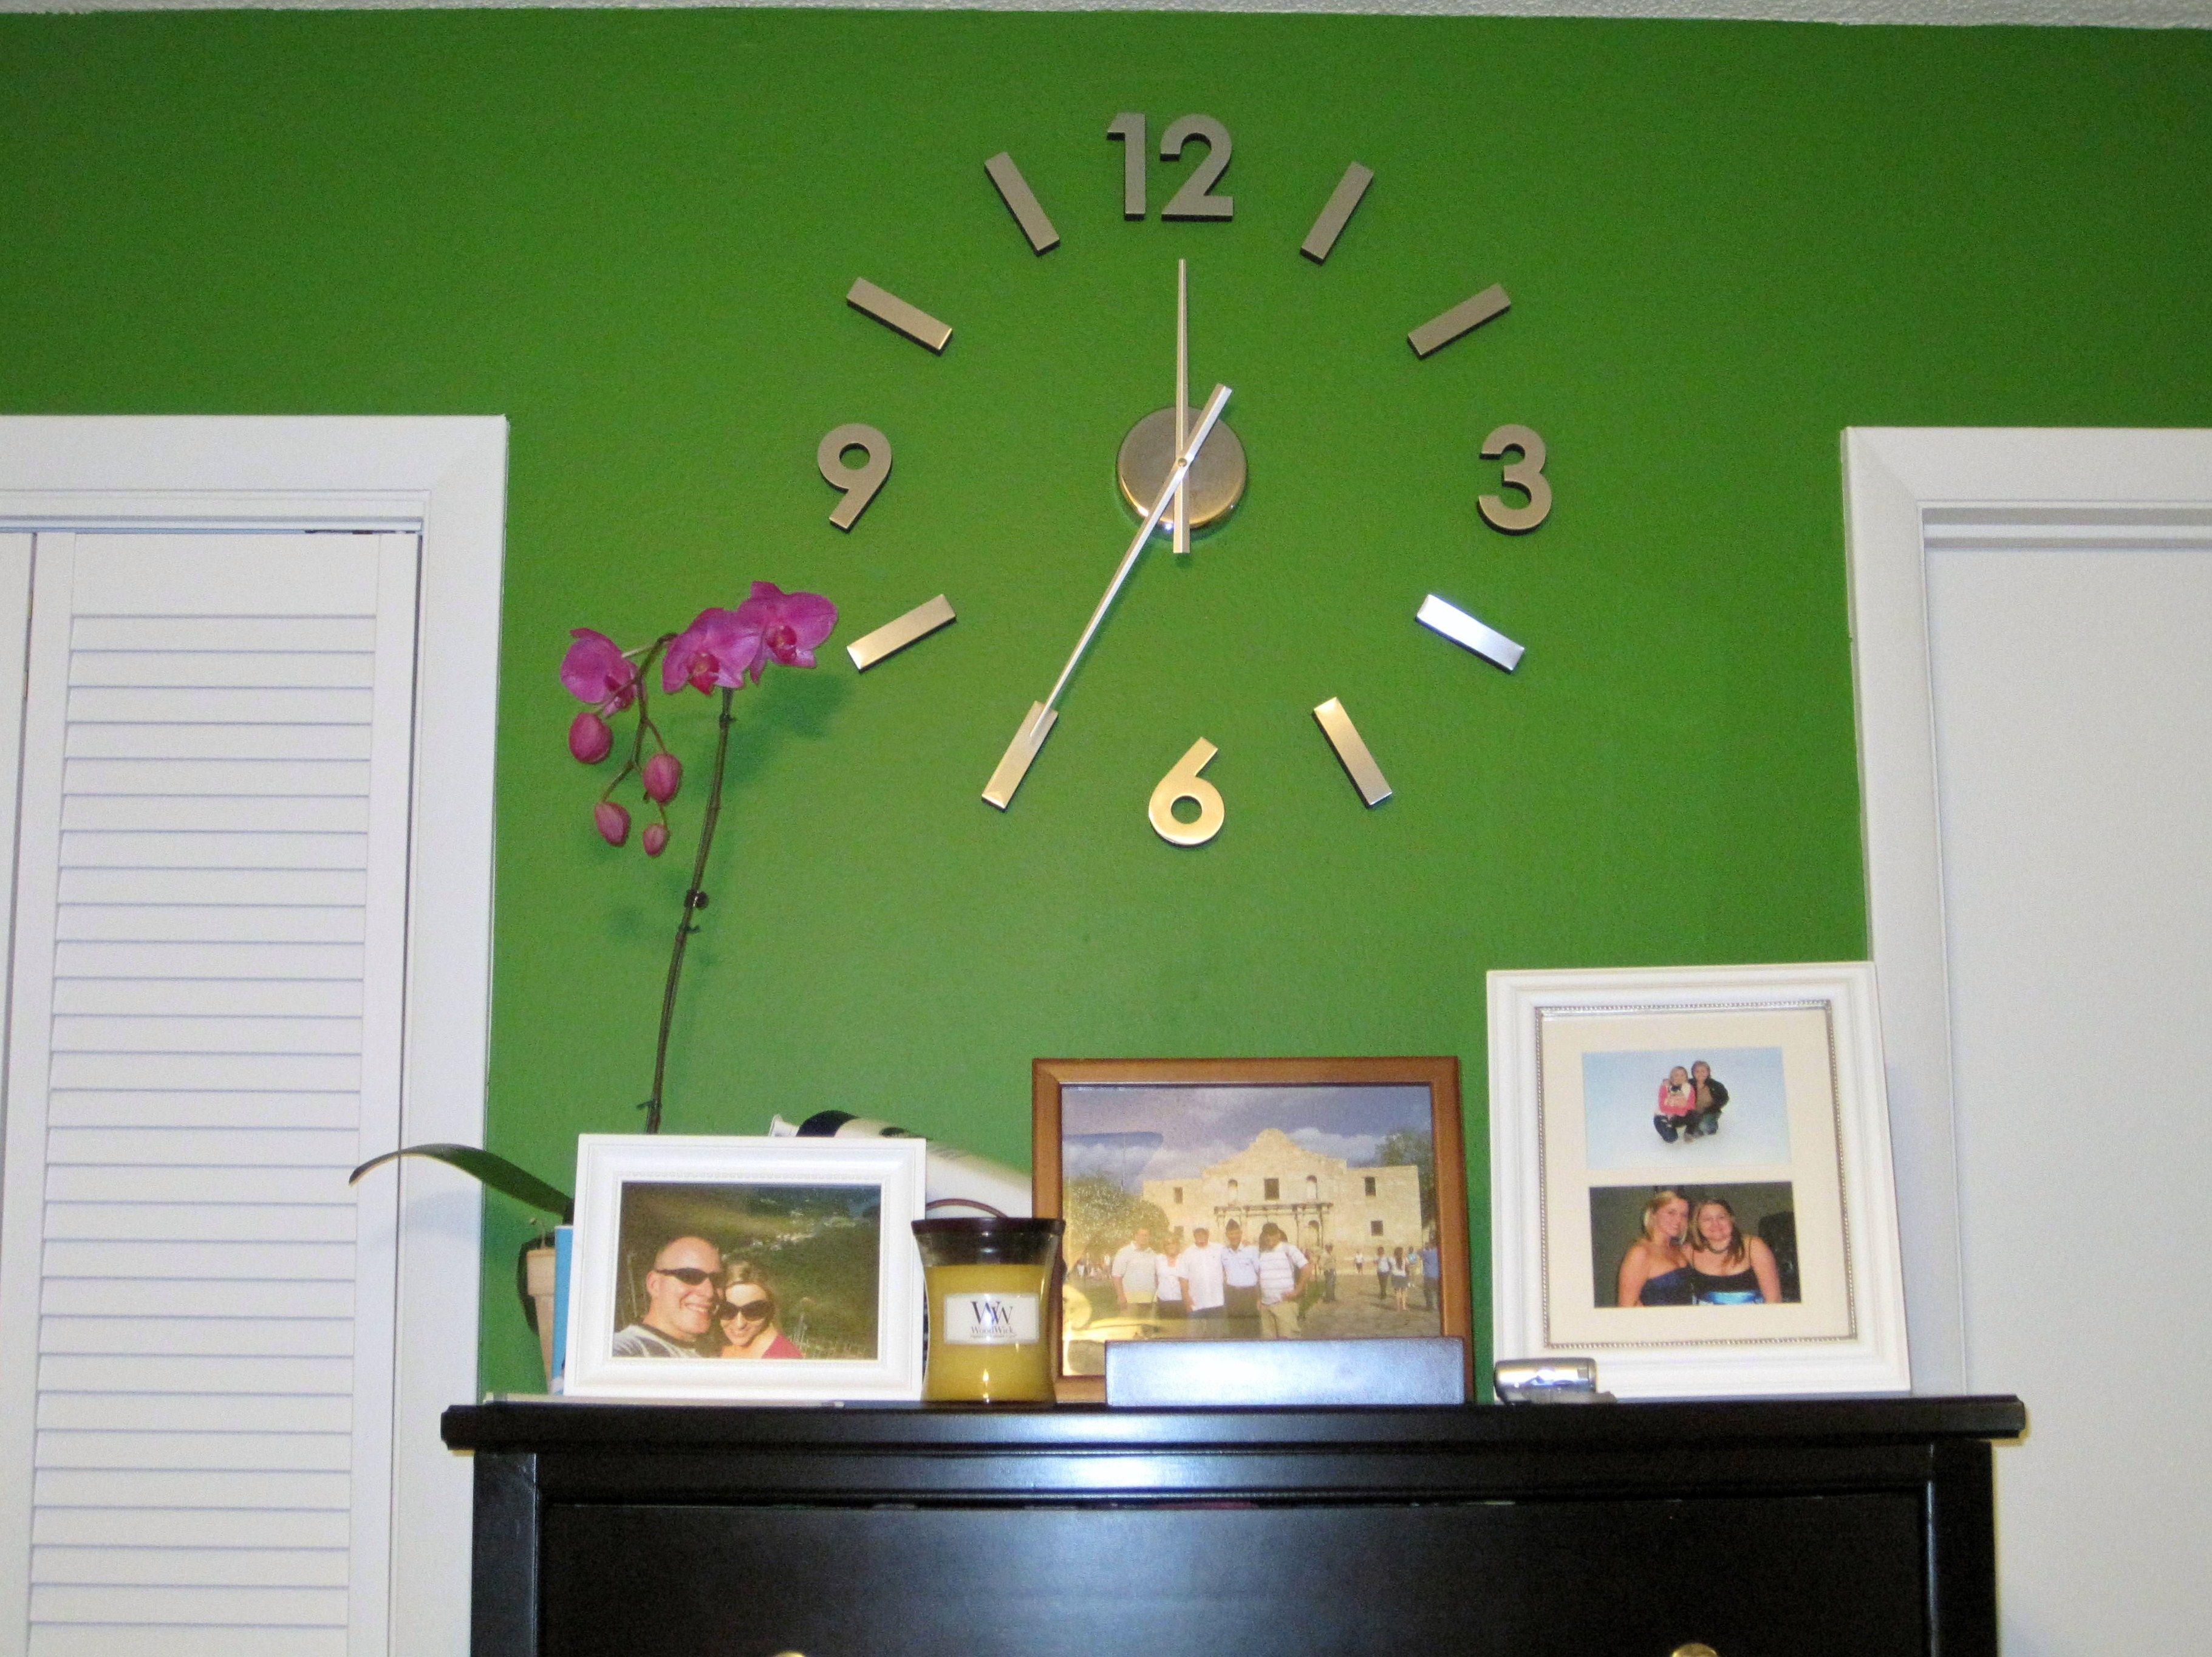 coolest clock ever.